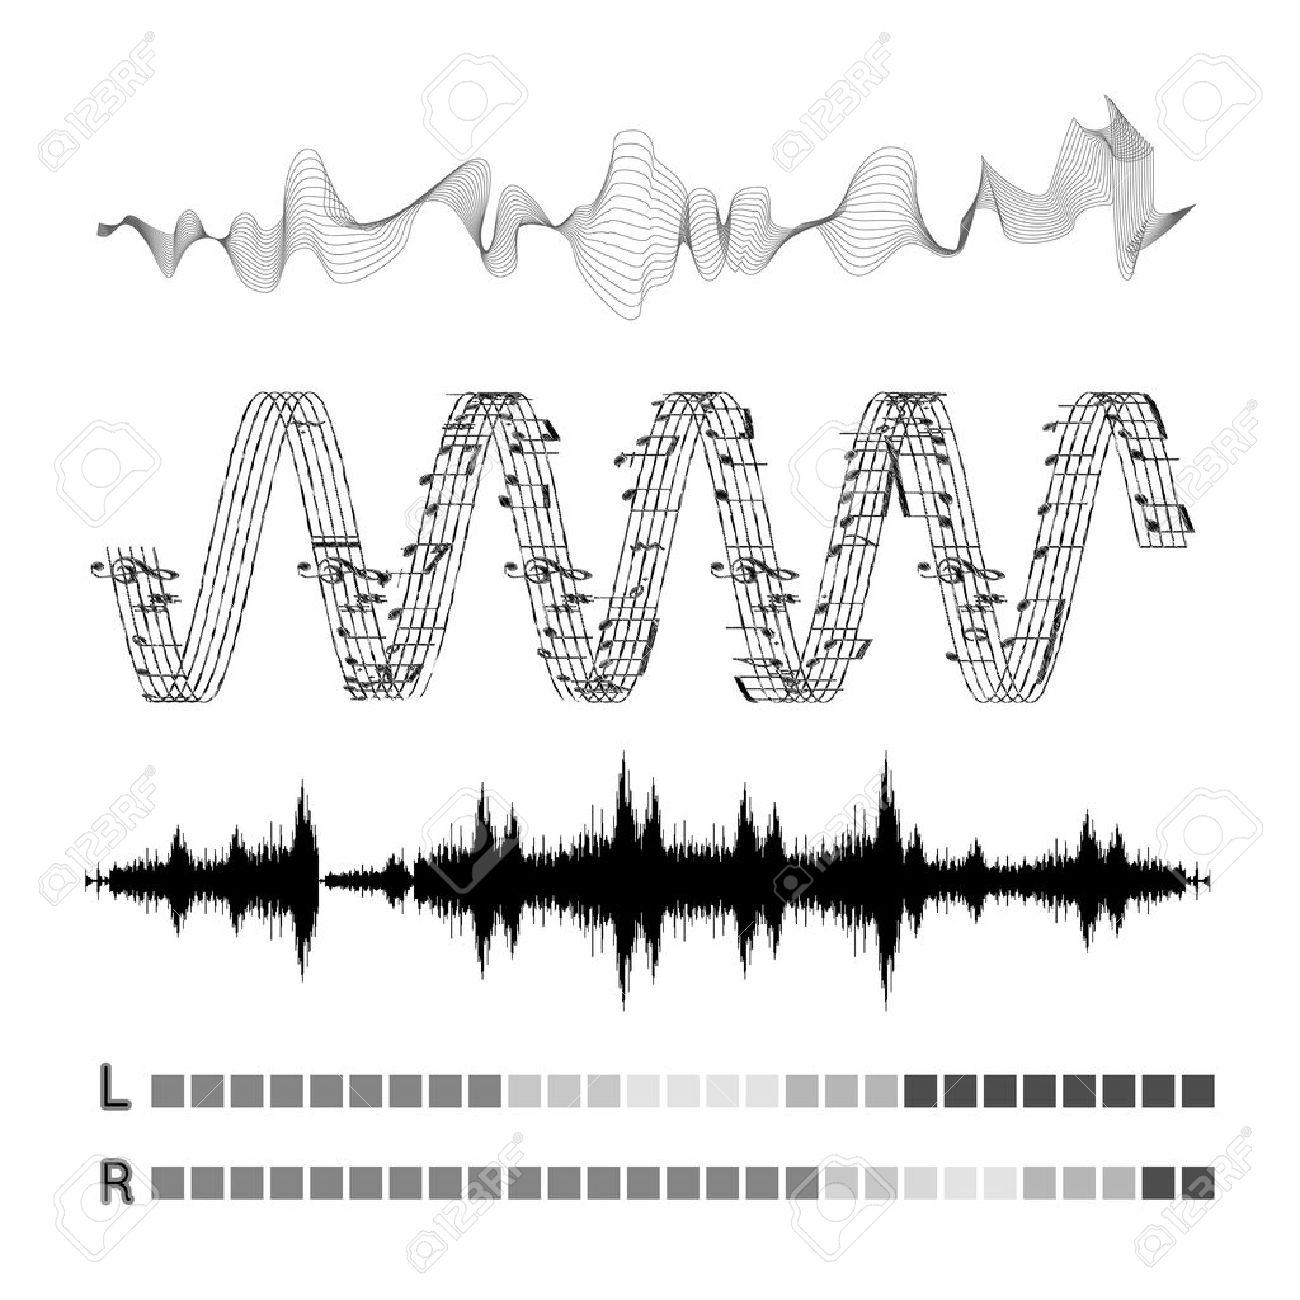 Vector sound waves set - 40874668